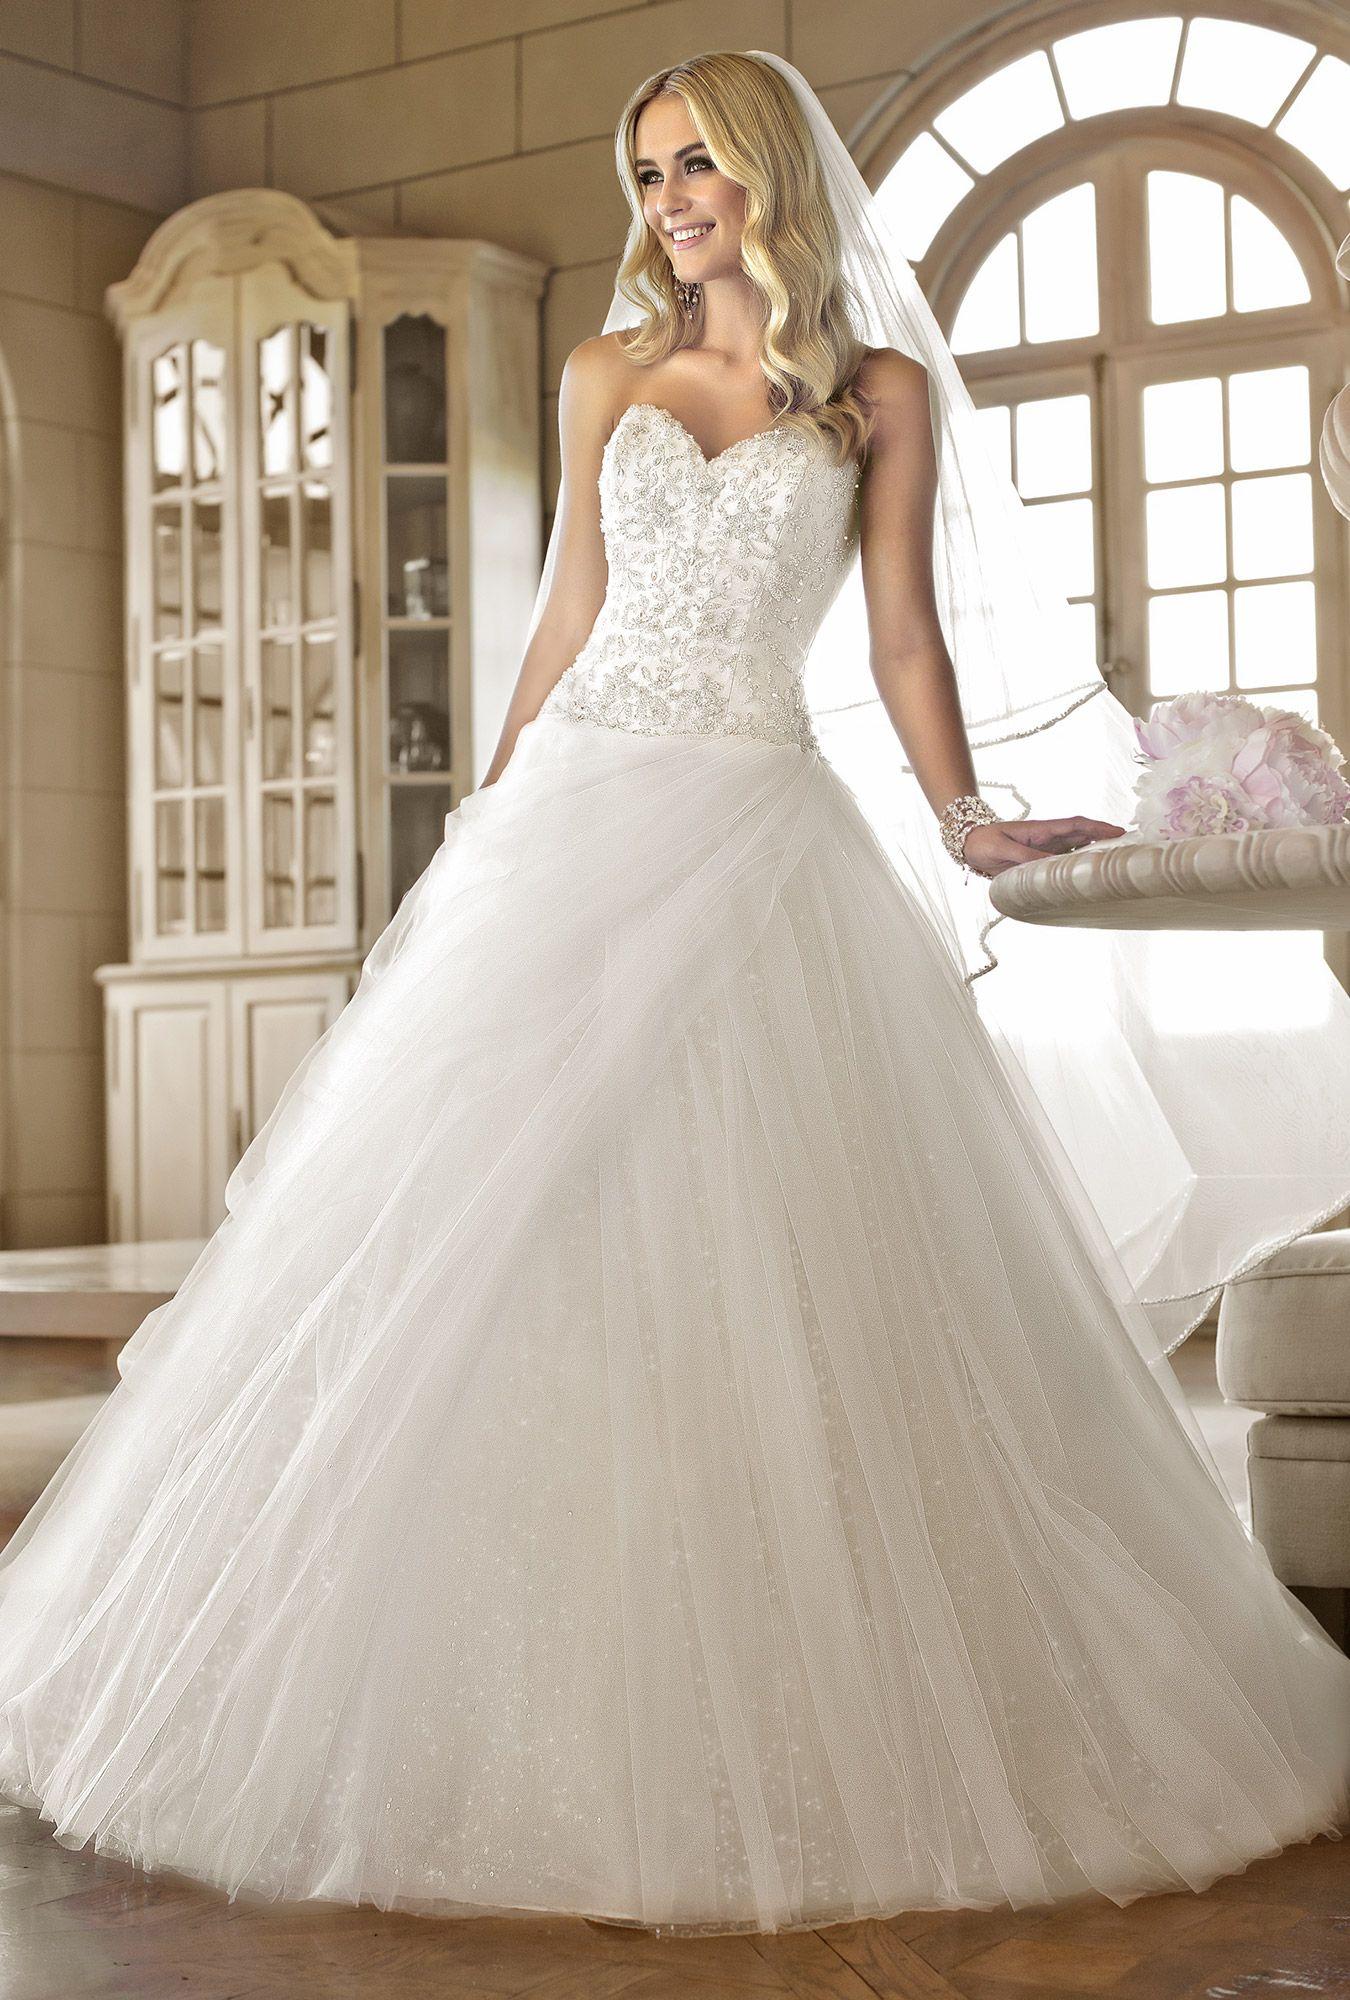 Stella york vneck wedding dress fairytale wedding dresses